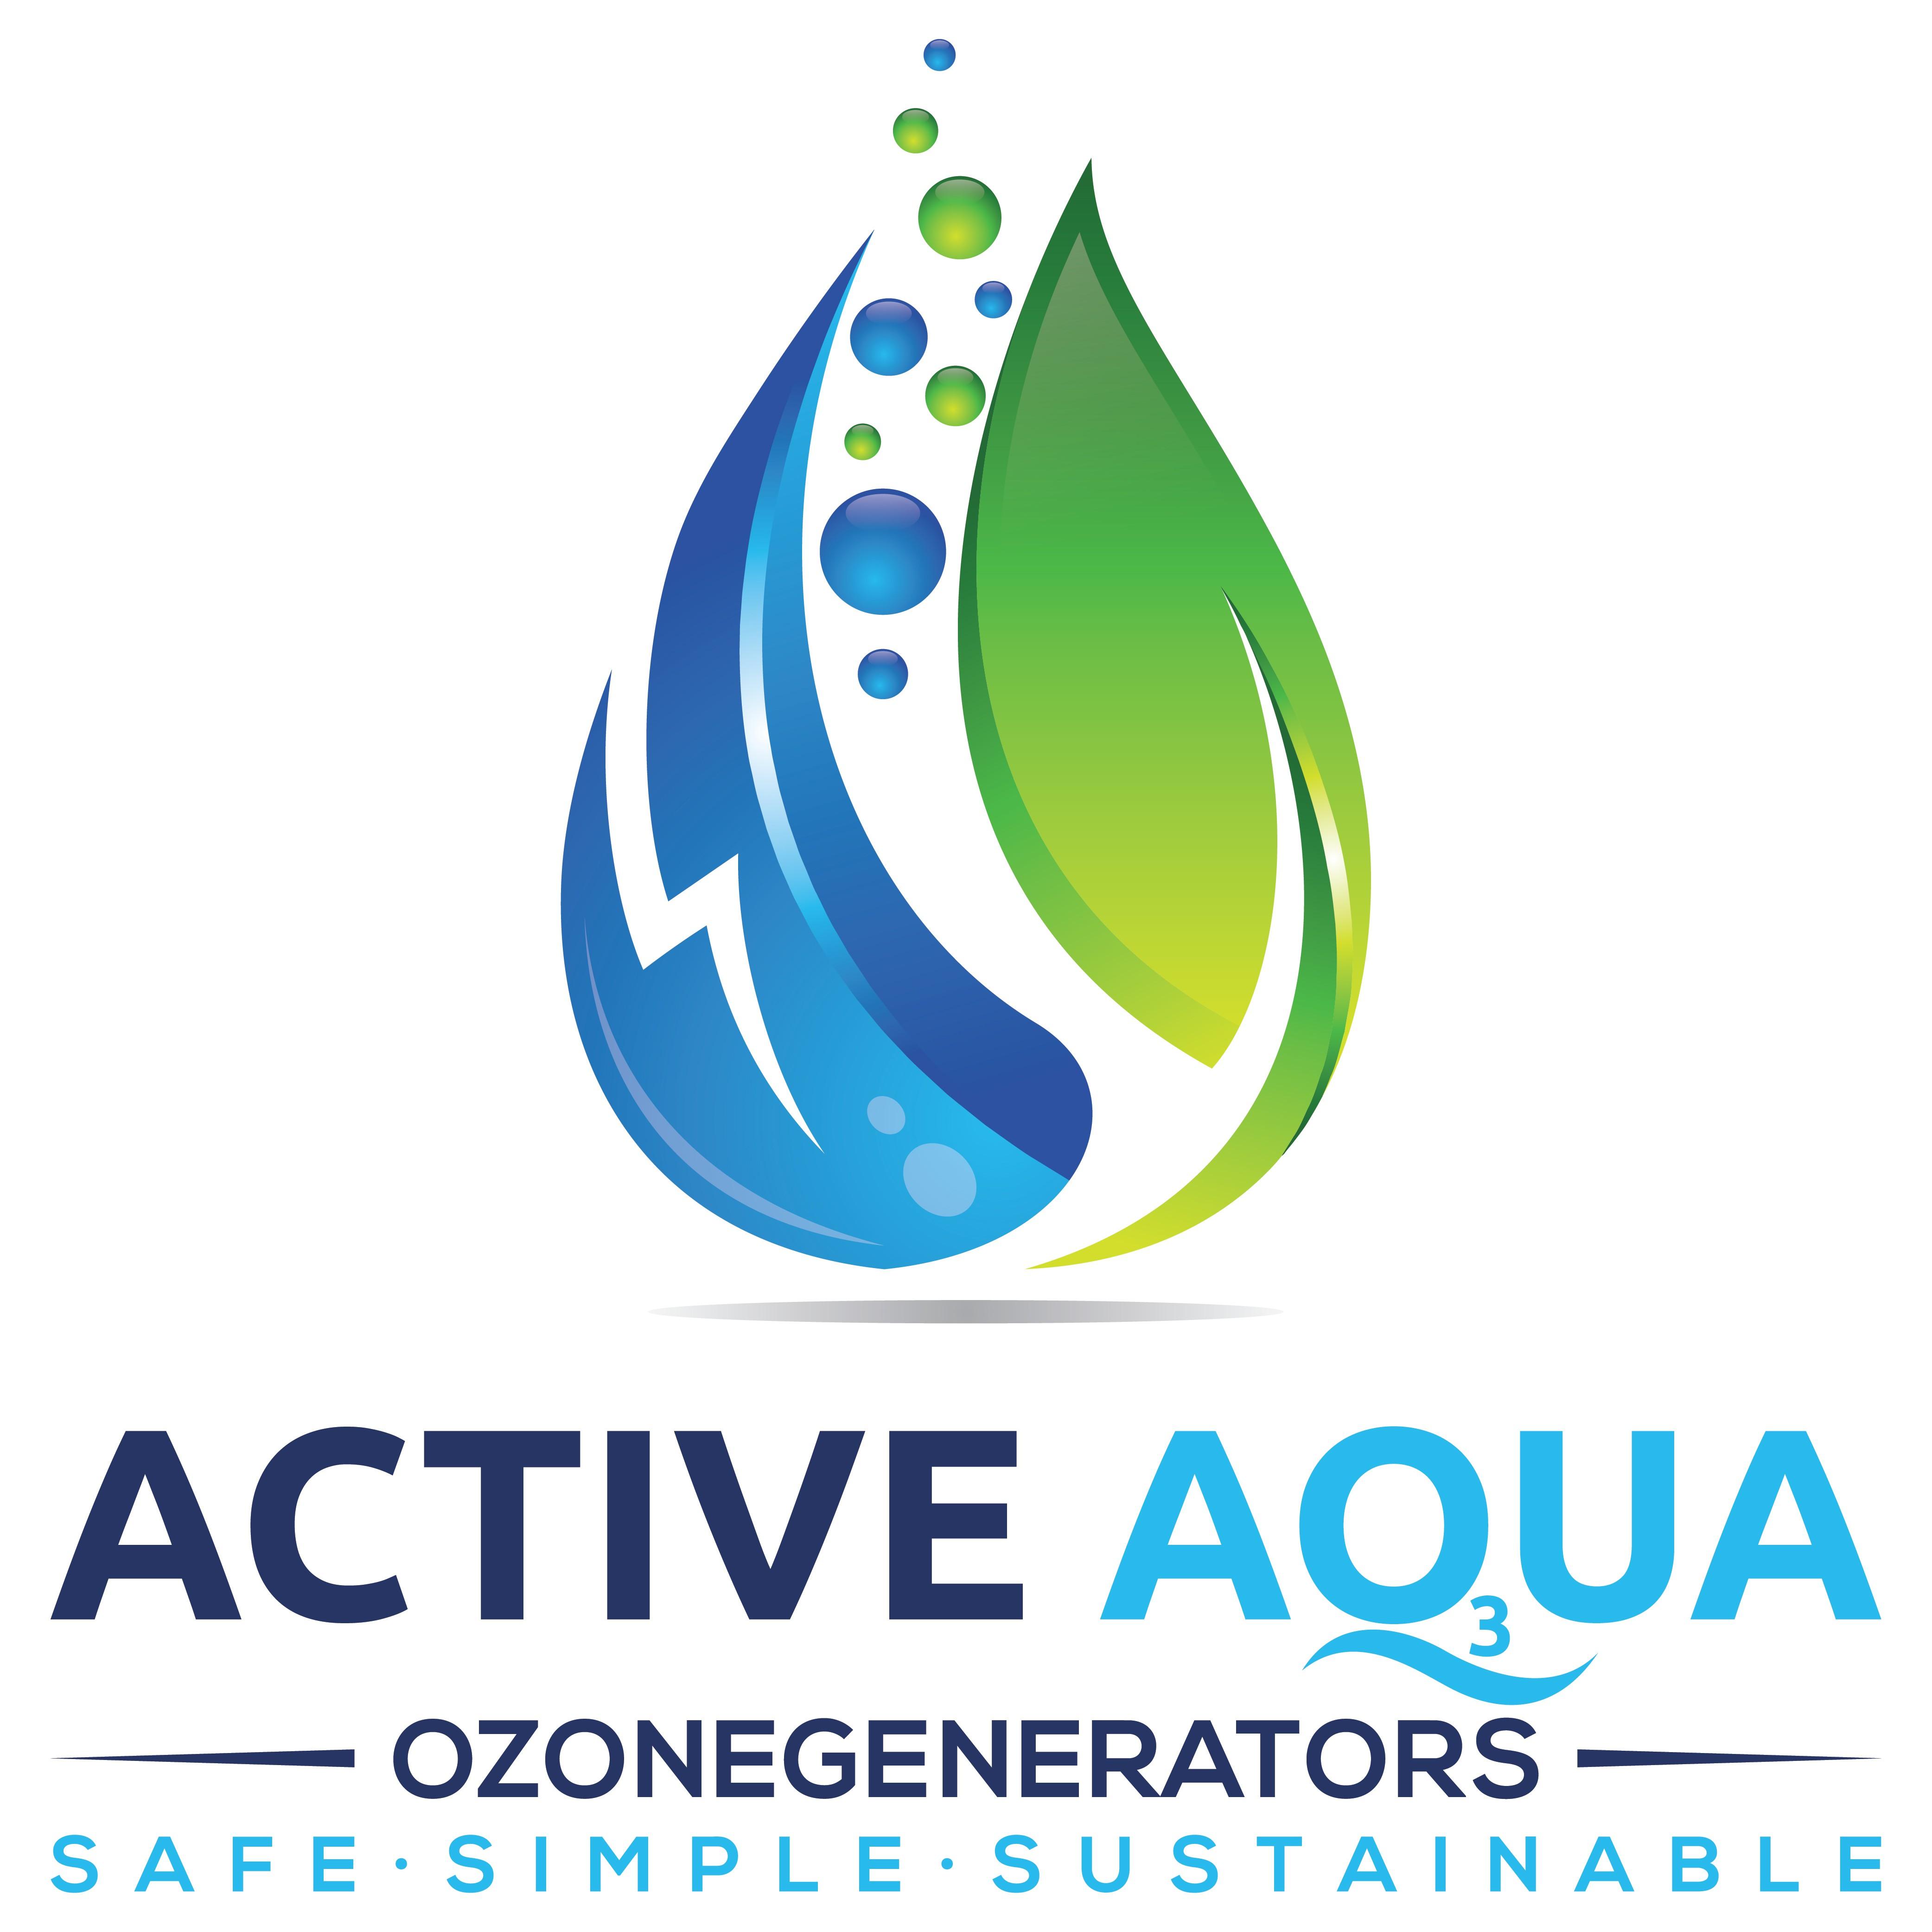 Innovative, Cost Effective, Ozone generators